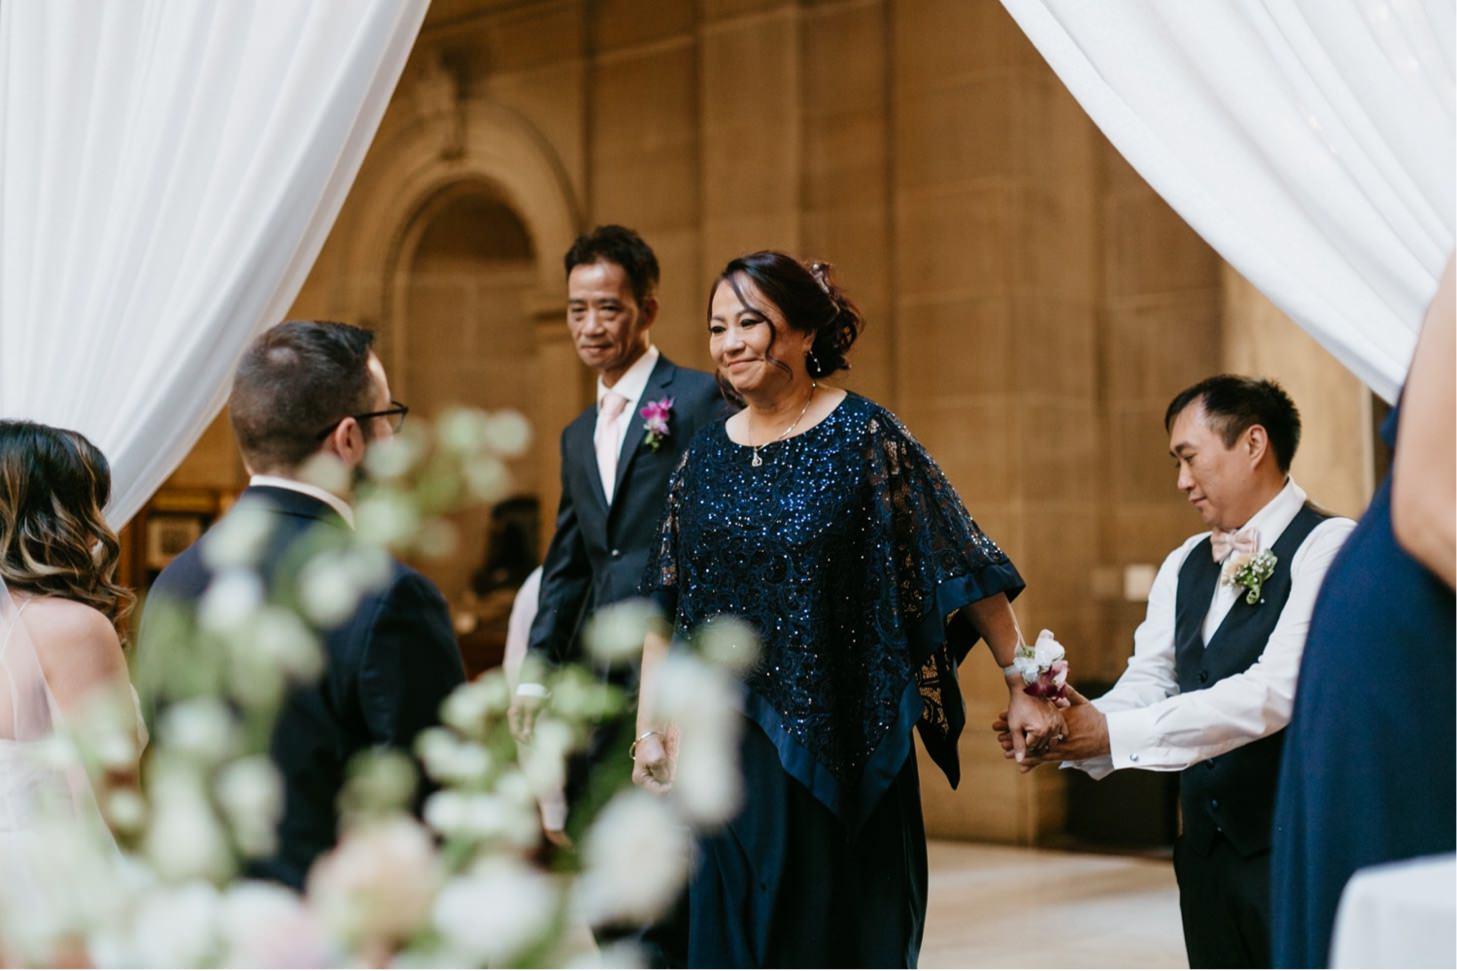 indiana-state-house-wedding-downtown-indianapolis-wedding-photographer041.JPG